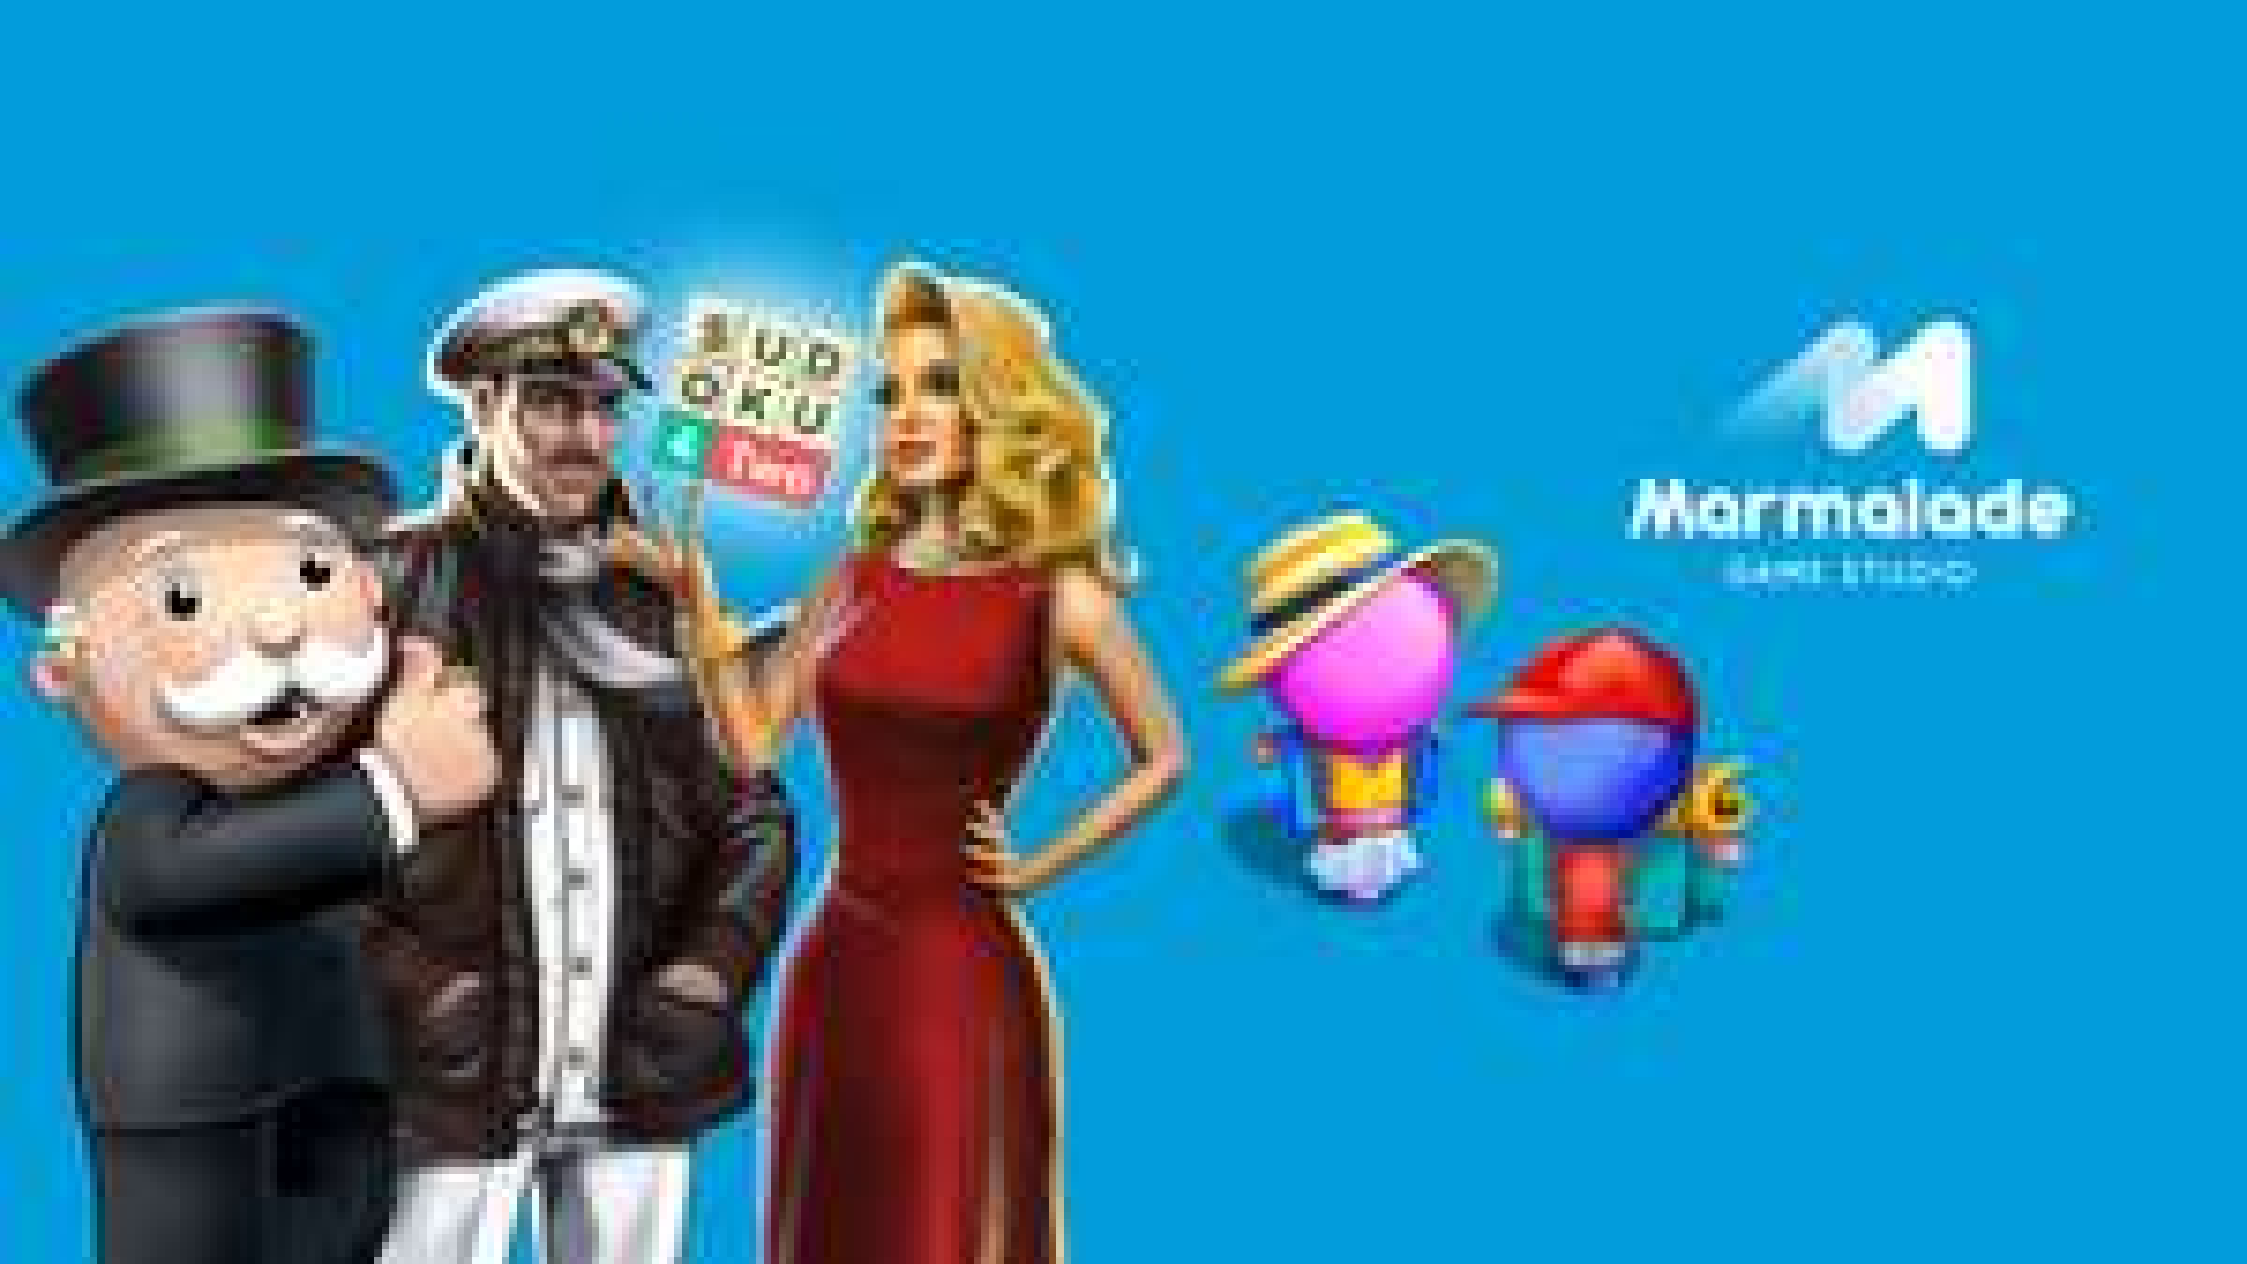 [Google Play Store] Monopoly, Cluedo, Spiel d. Lebens & Flottenmanöver | preisreduziert | enthält IAK